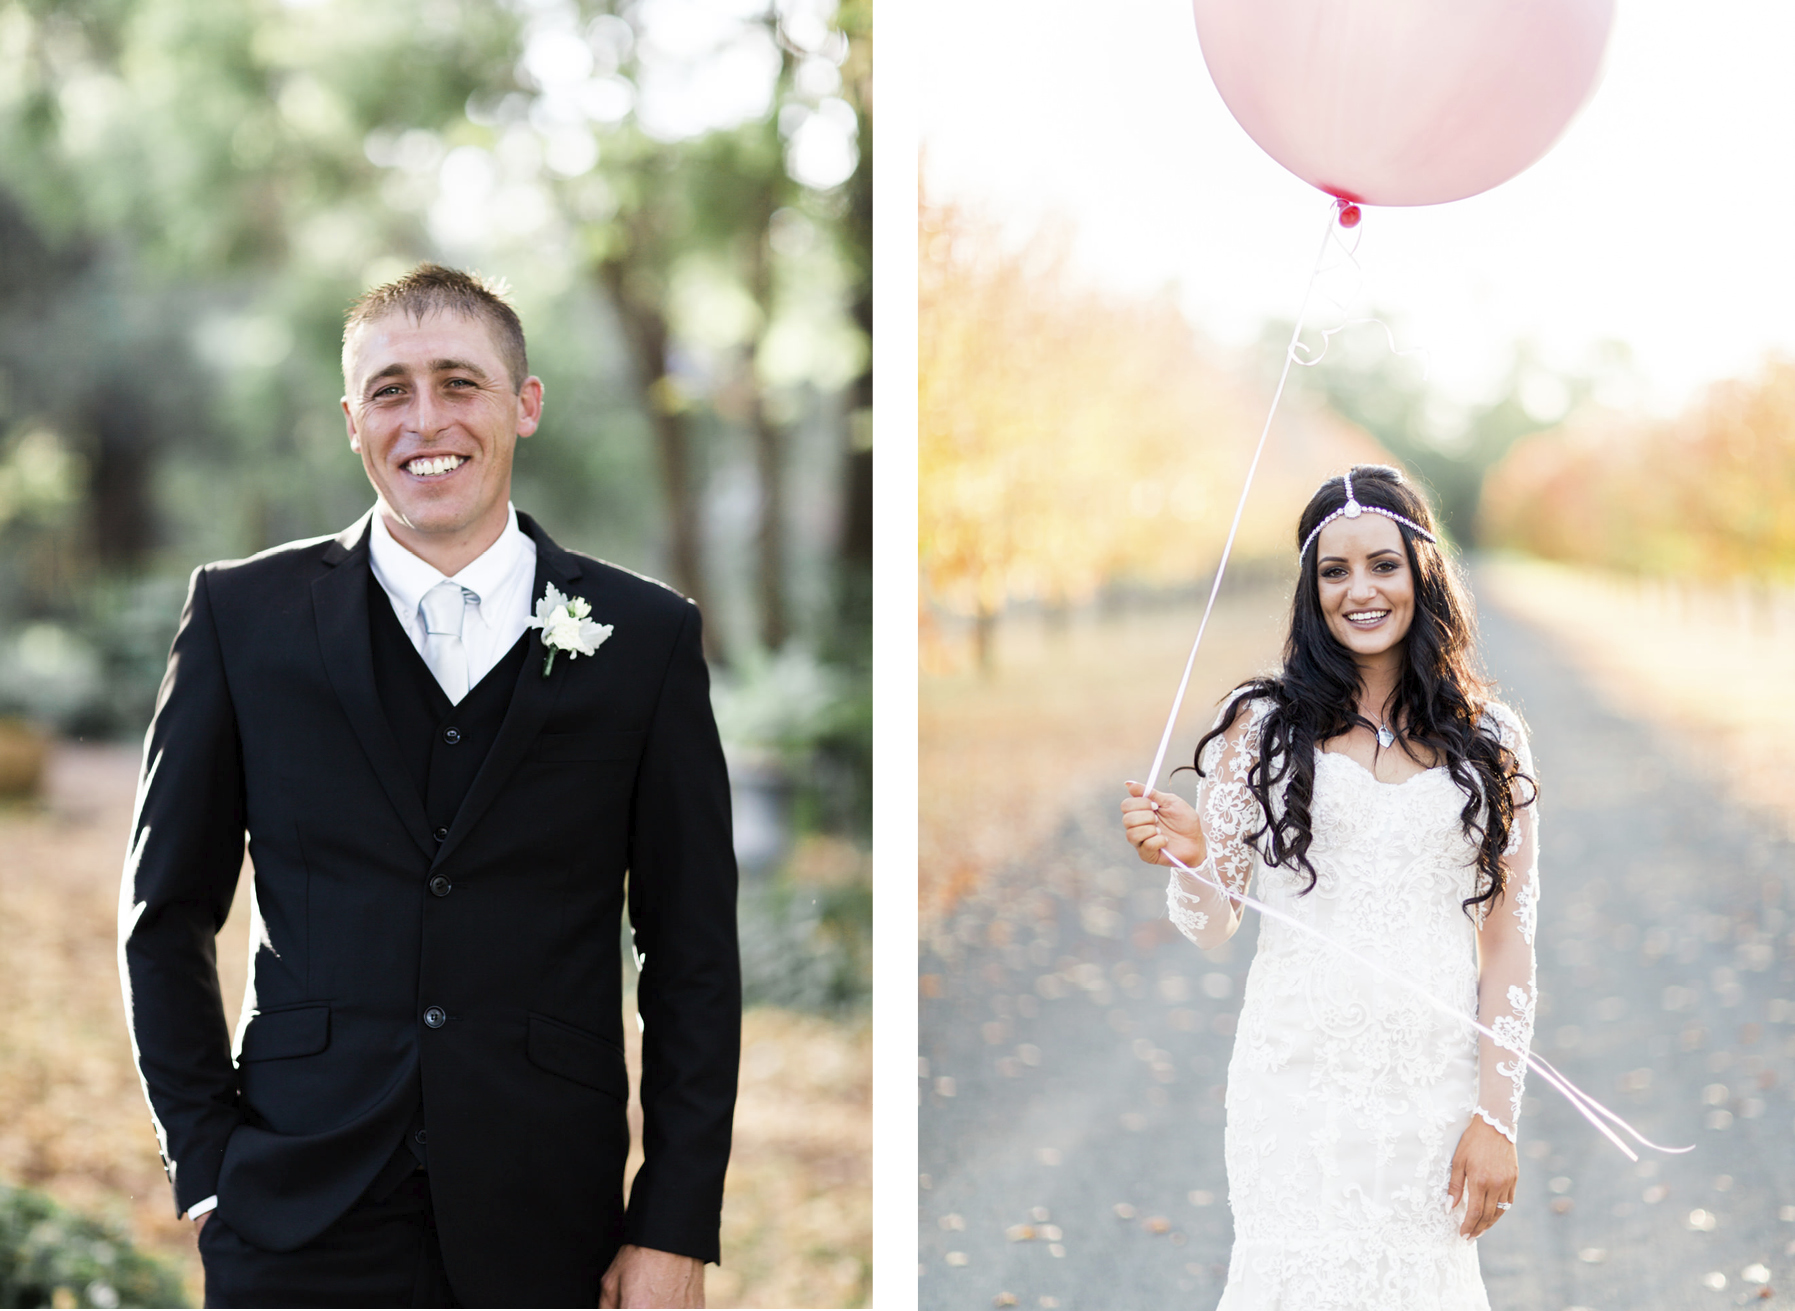 WeddingPhotos_Facebook_2046pixels-1516 joined.jpg